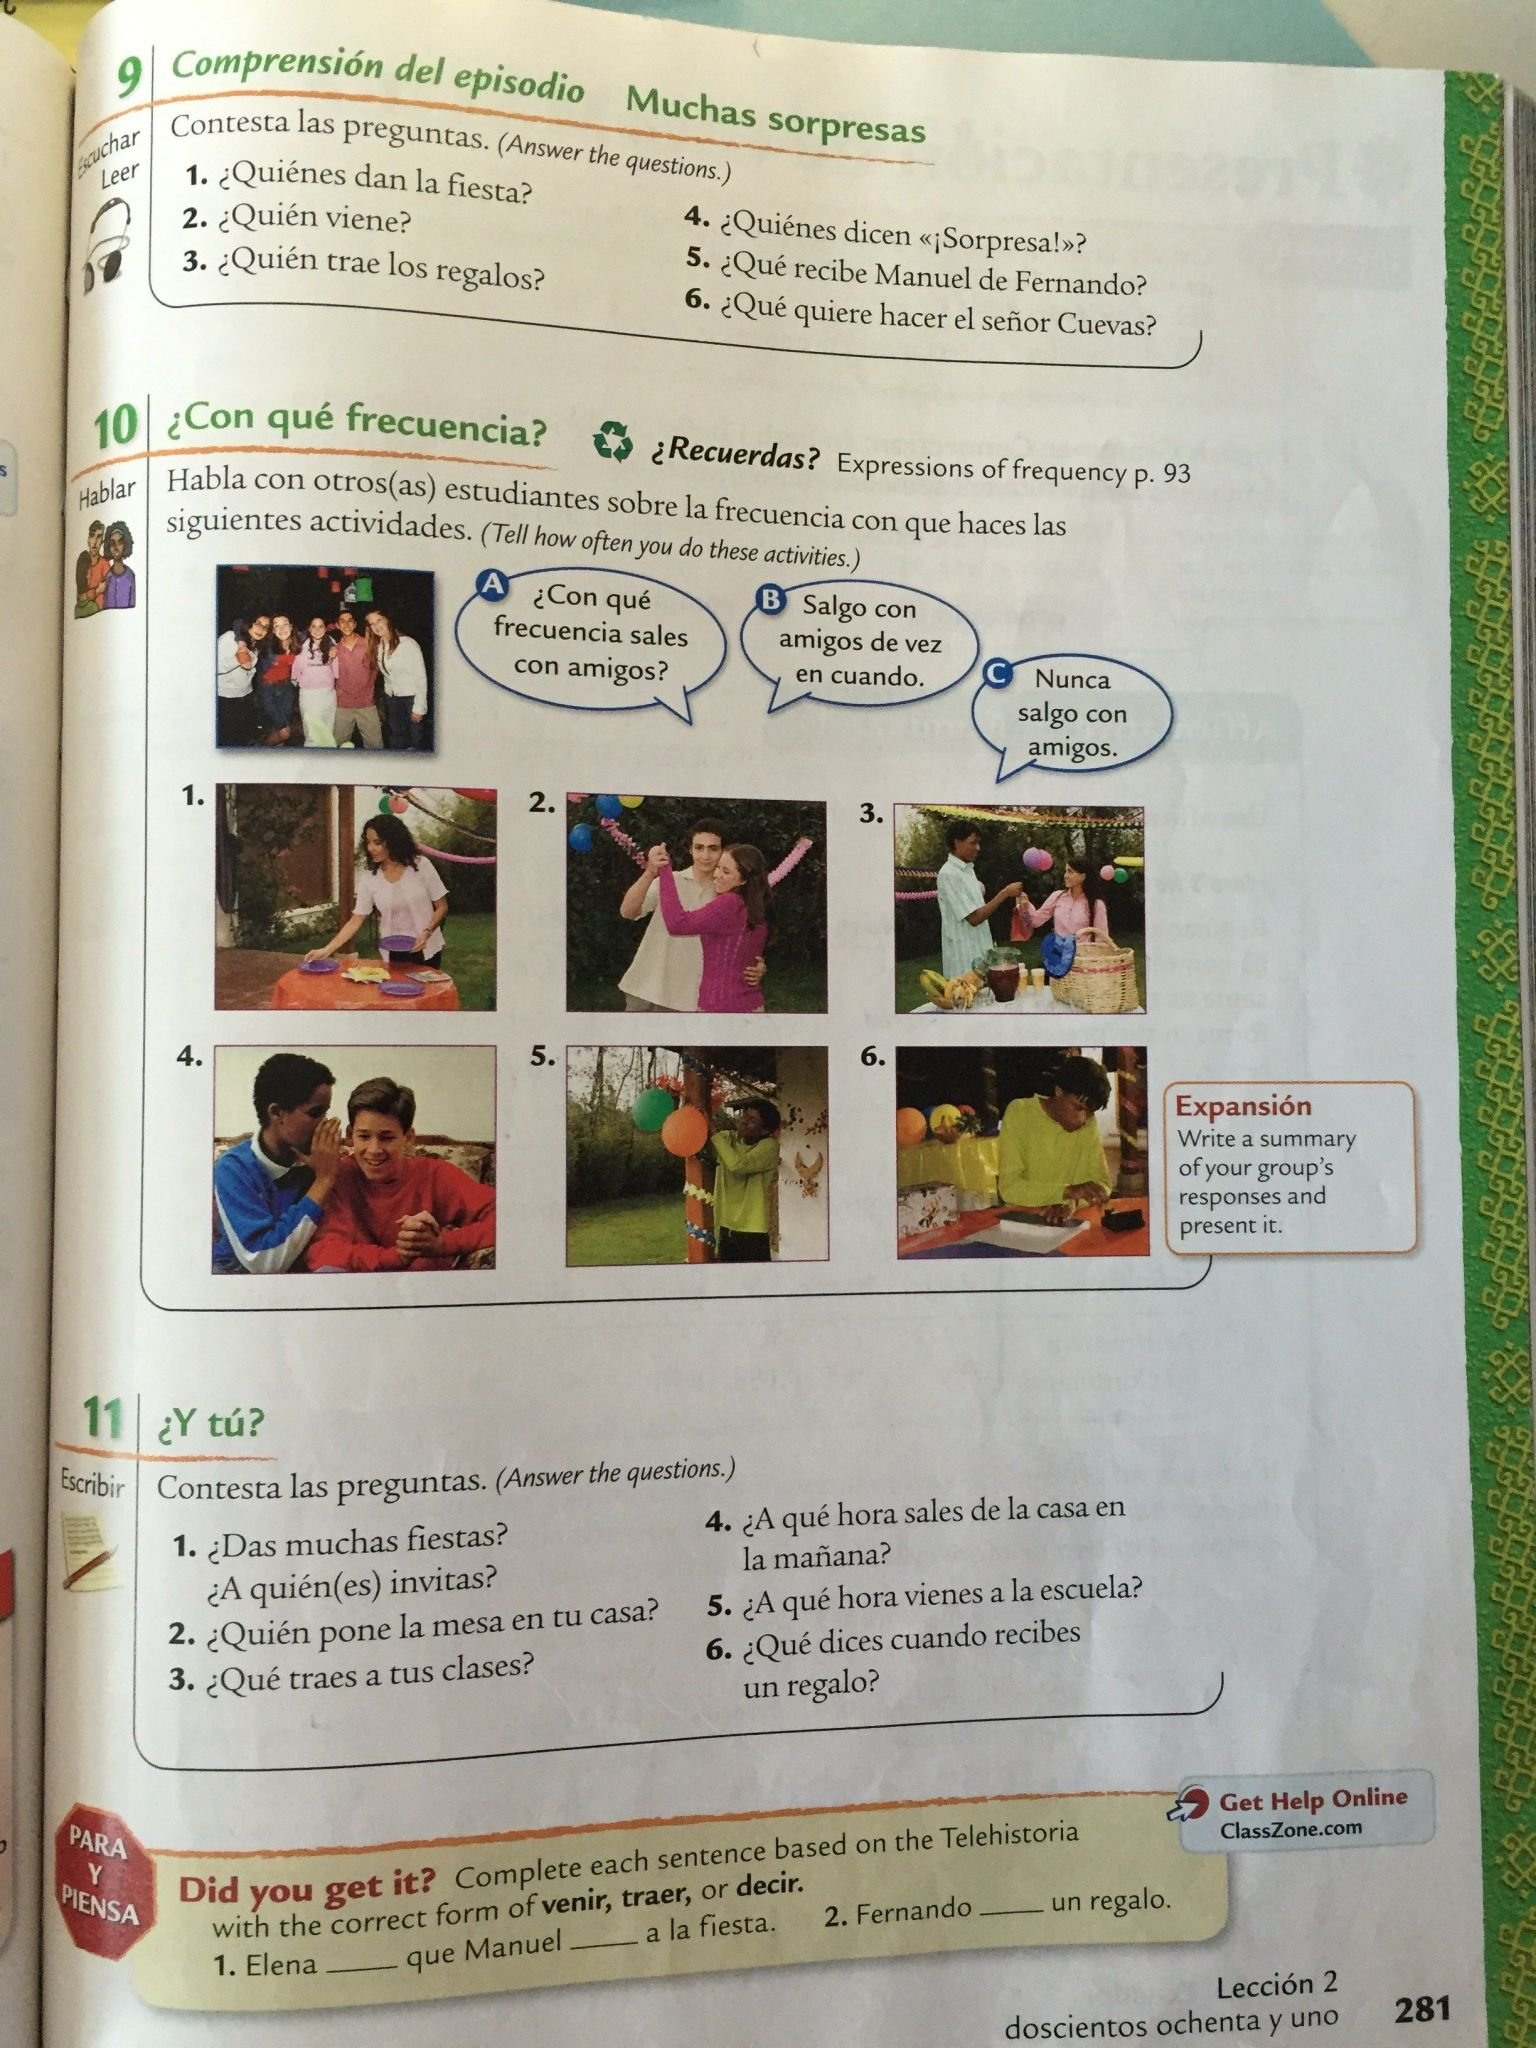 Adjectives Worksheet 3 Spanish Answers  Briefencounters For Adjectives Worksheet 3 Spanish Answers